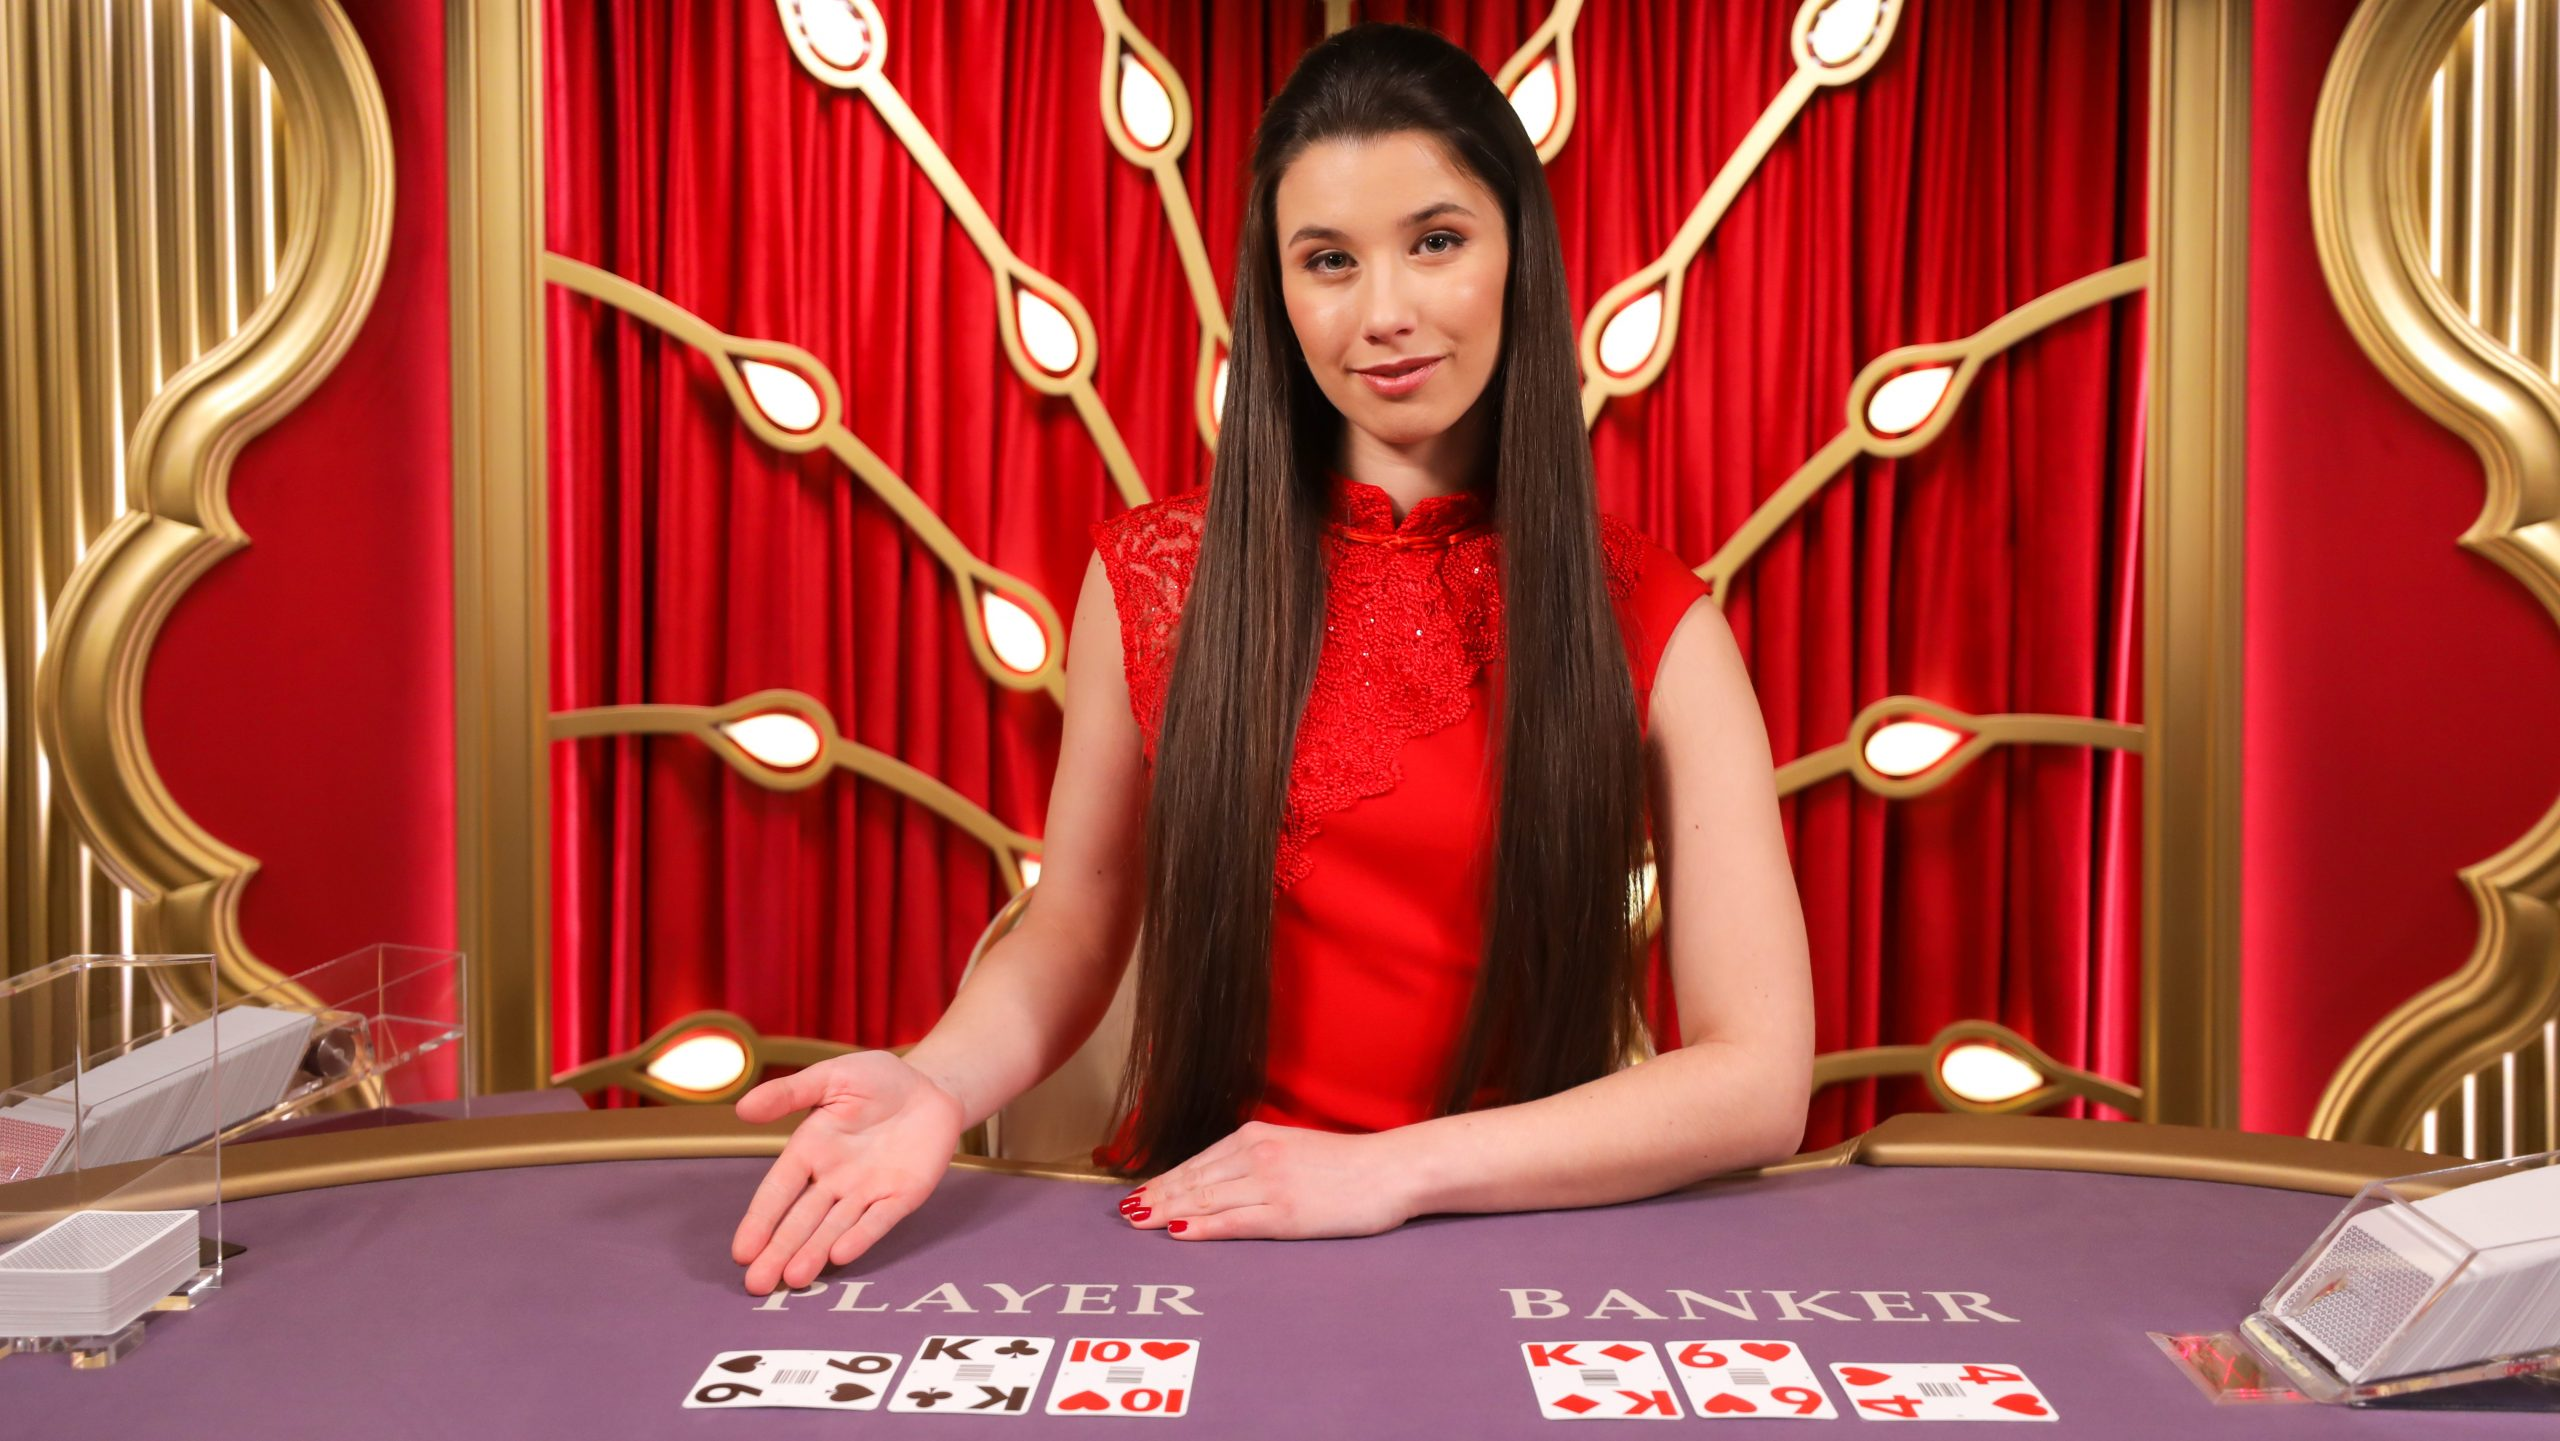 Evolution Live Casino Baccarat 2